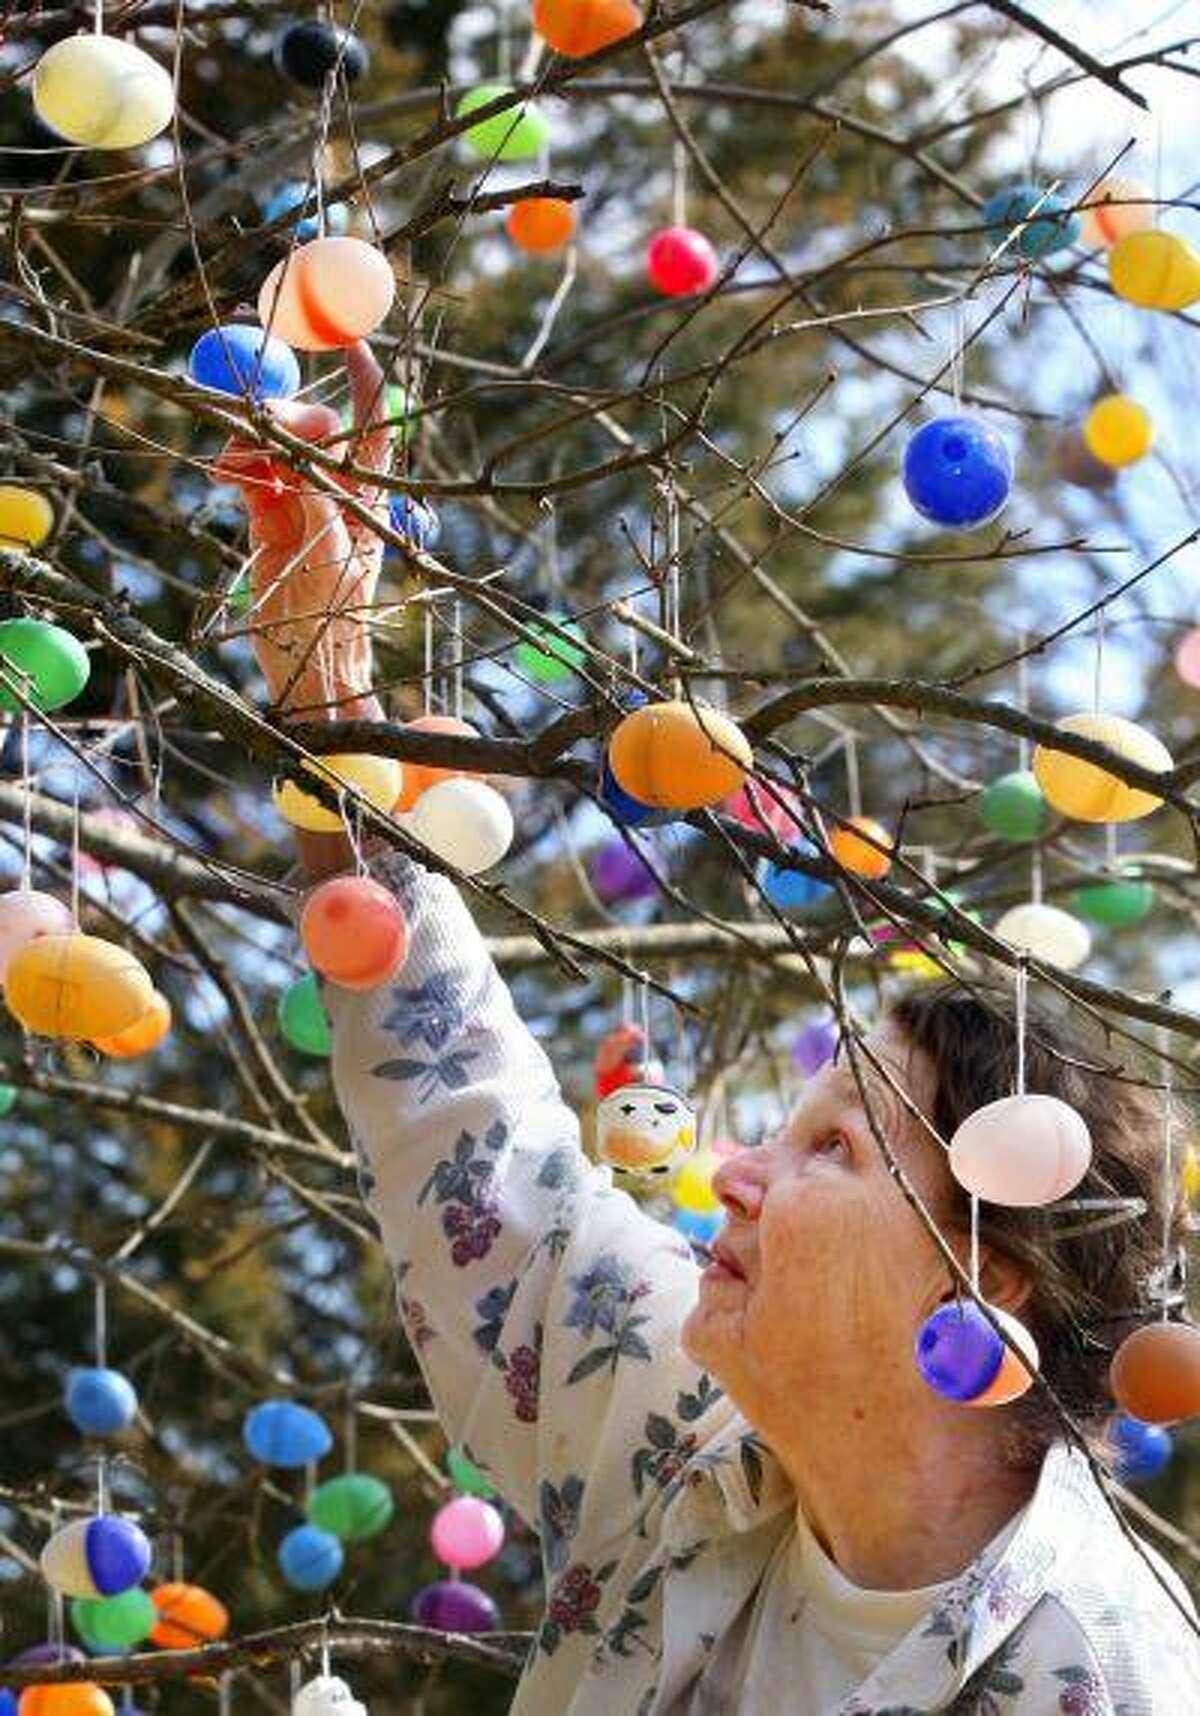 Elsie Palmer of Virginia begins to clean up vandalism left behind by the Easter Bunny earlier this month.